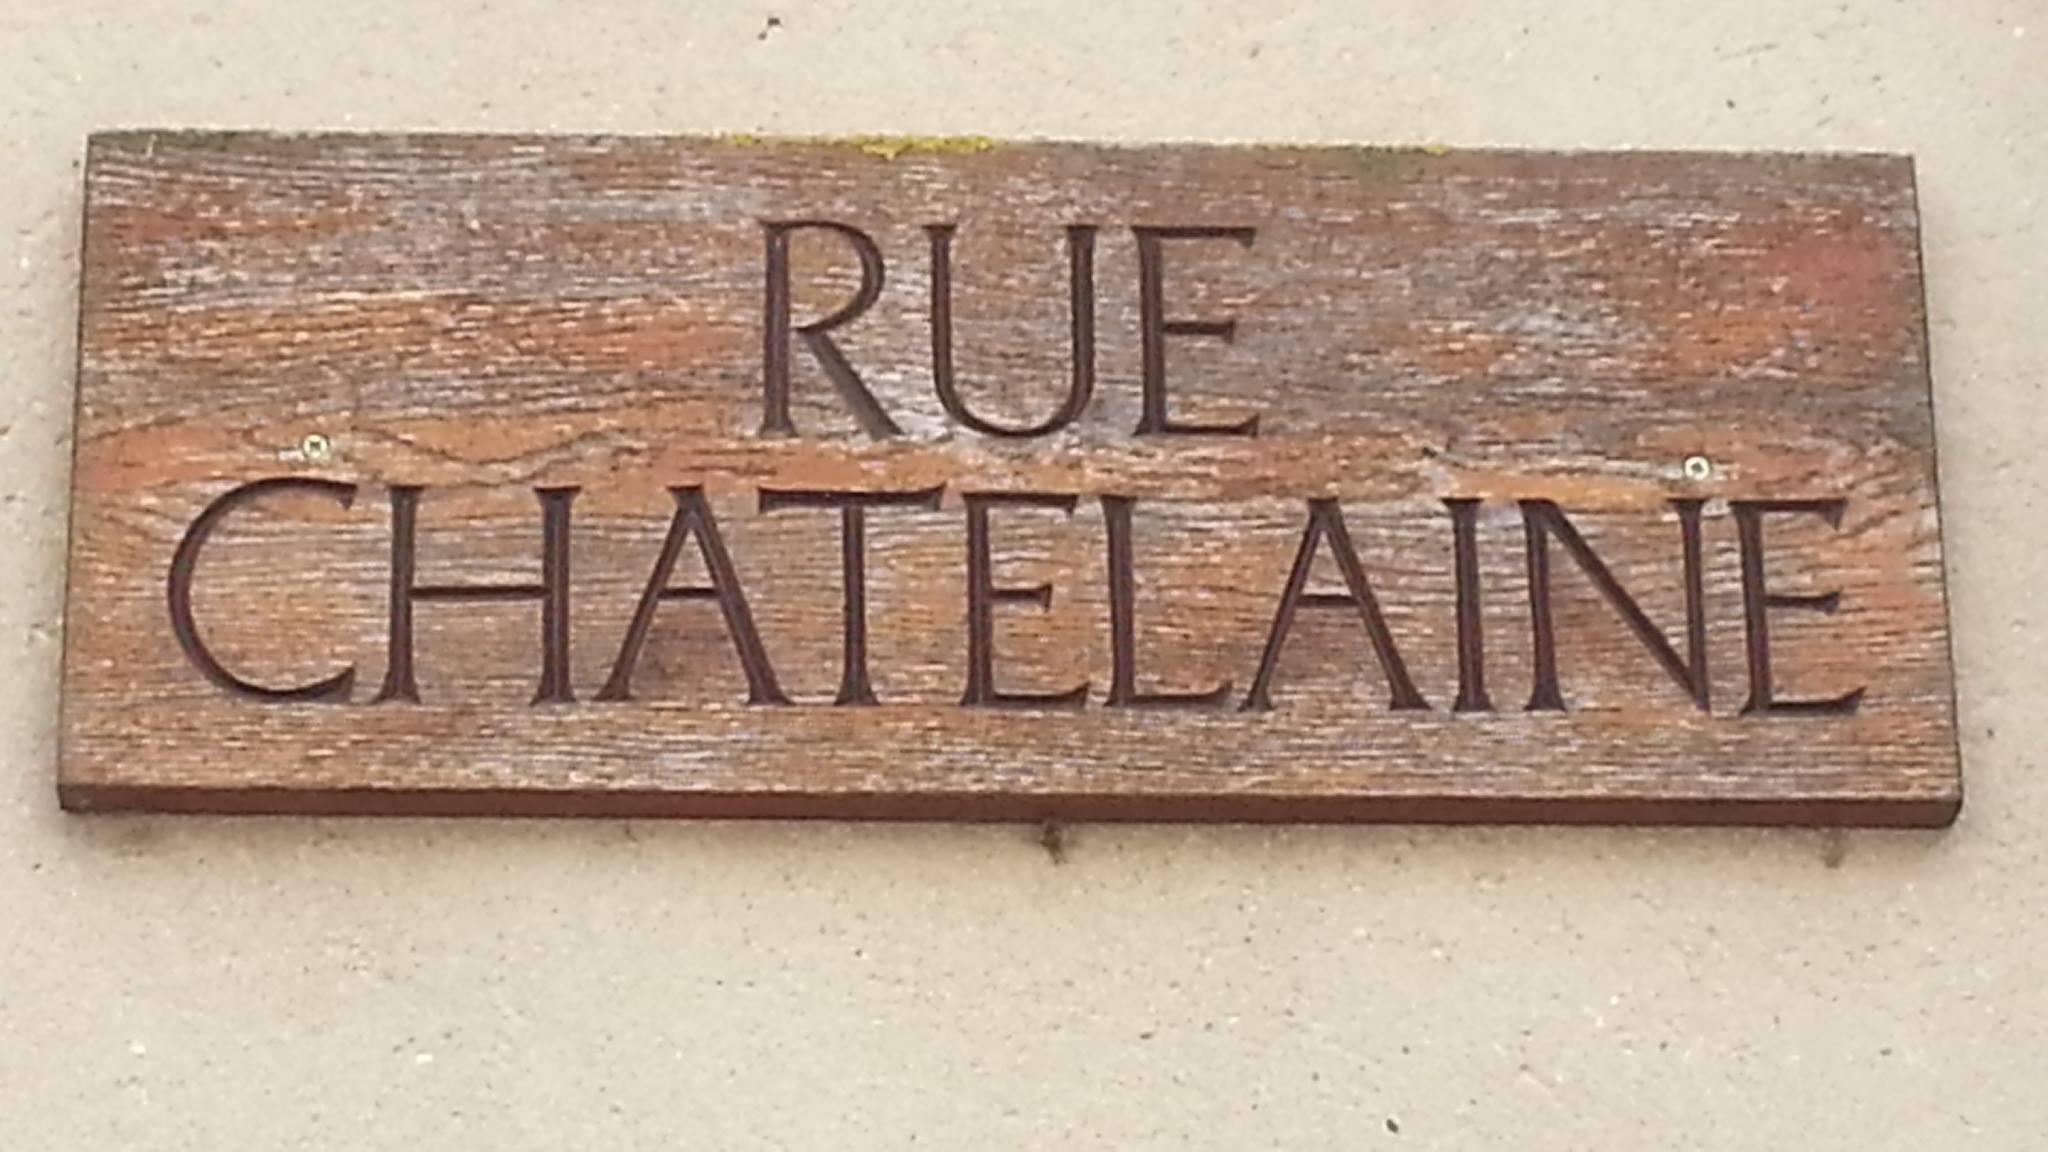 Mamers - Plaque de rue - Rue Chatelaine (Fabienne Germain)